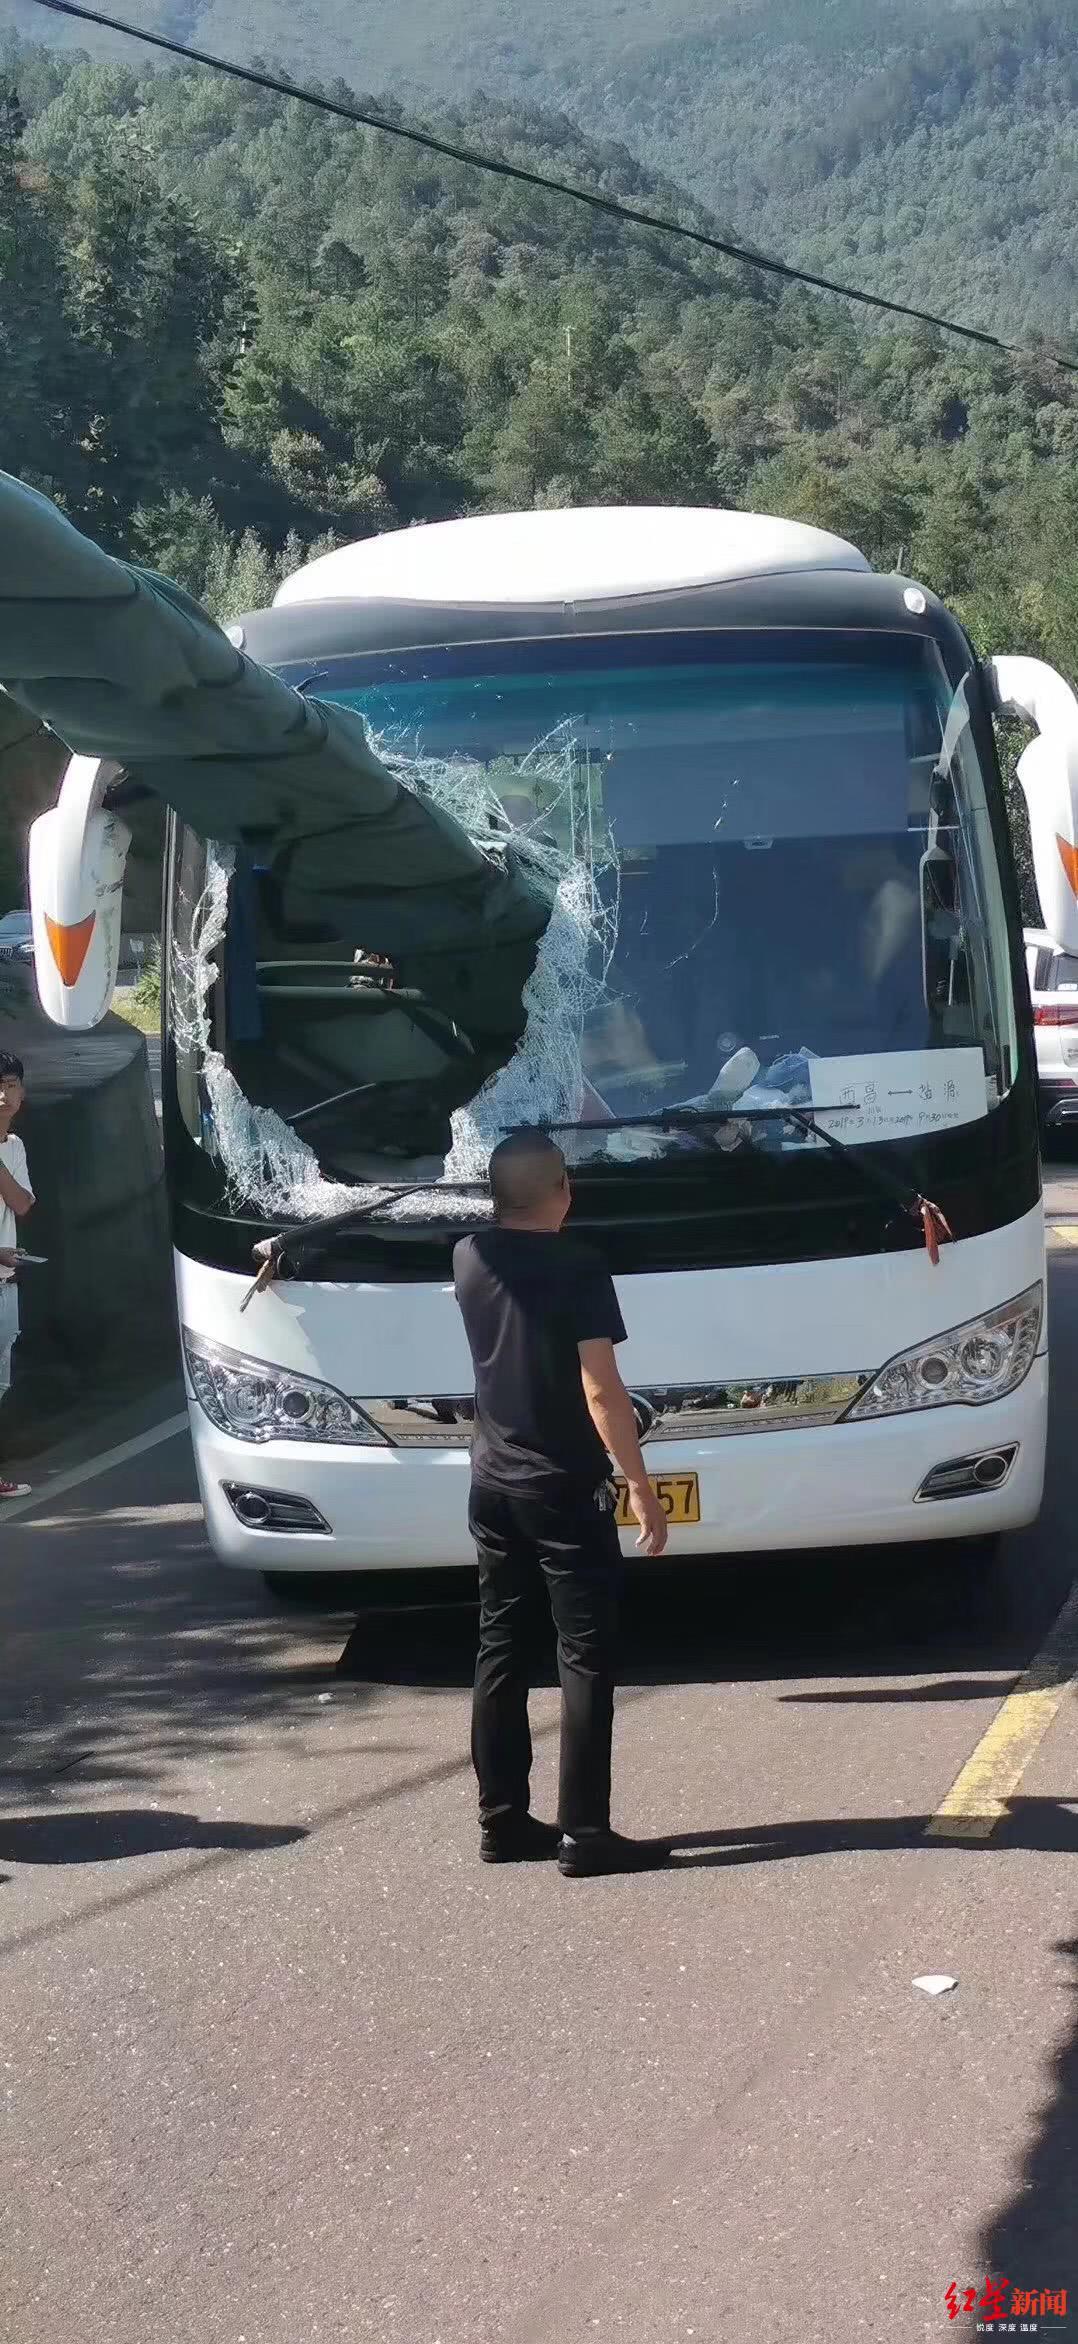 <b>惊险!风力发电扇叶穿进西昌至盐源班车,幸无人员伤亡</b>